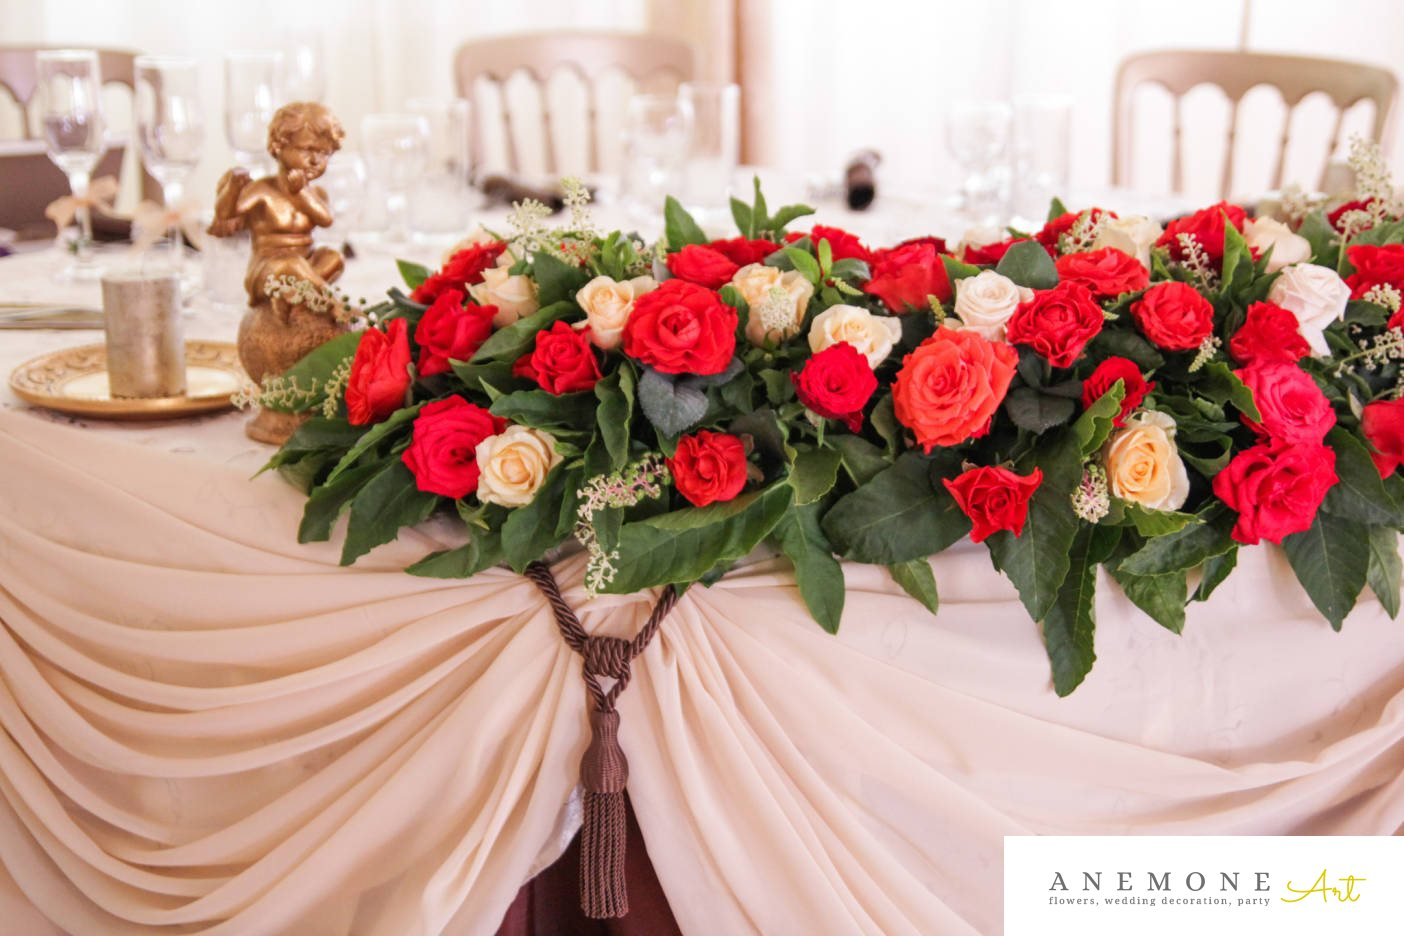 Poza, foto cu Flori de nunta alb, ghirlanda flori, lumanare, prezidiu, rosu, trandafiri in Arad, Timisoara, Oradea (wedding flowers, bouquets) nunta Arad, Timisoara, Oradea